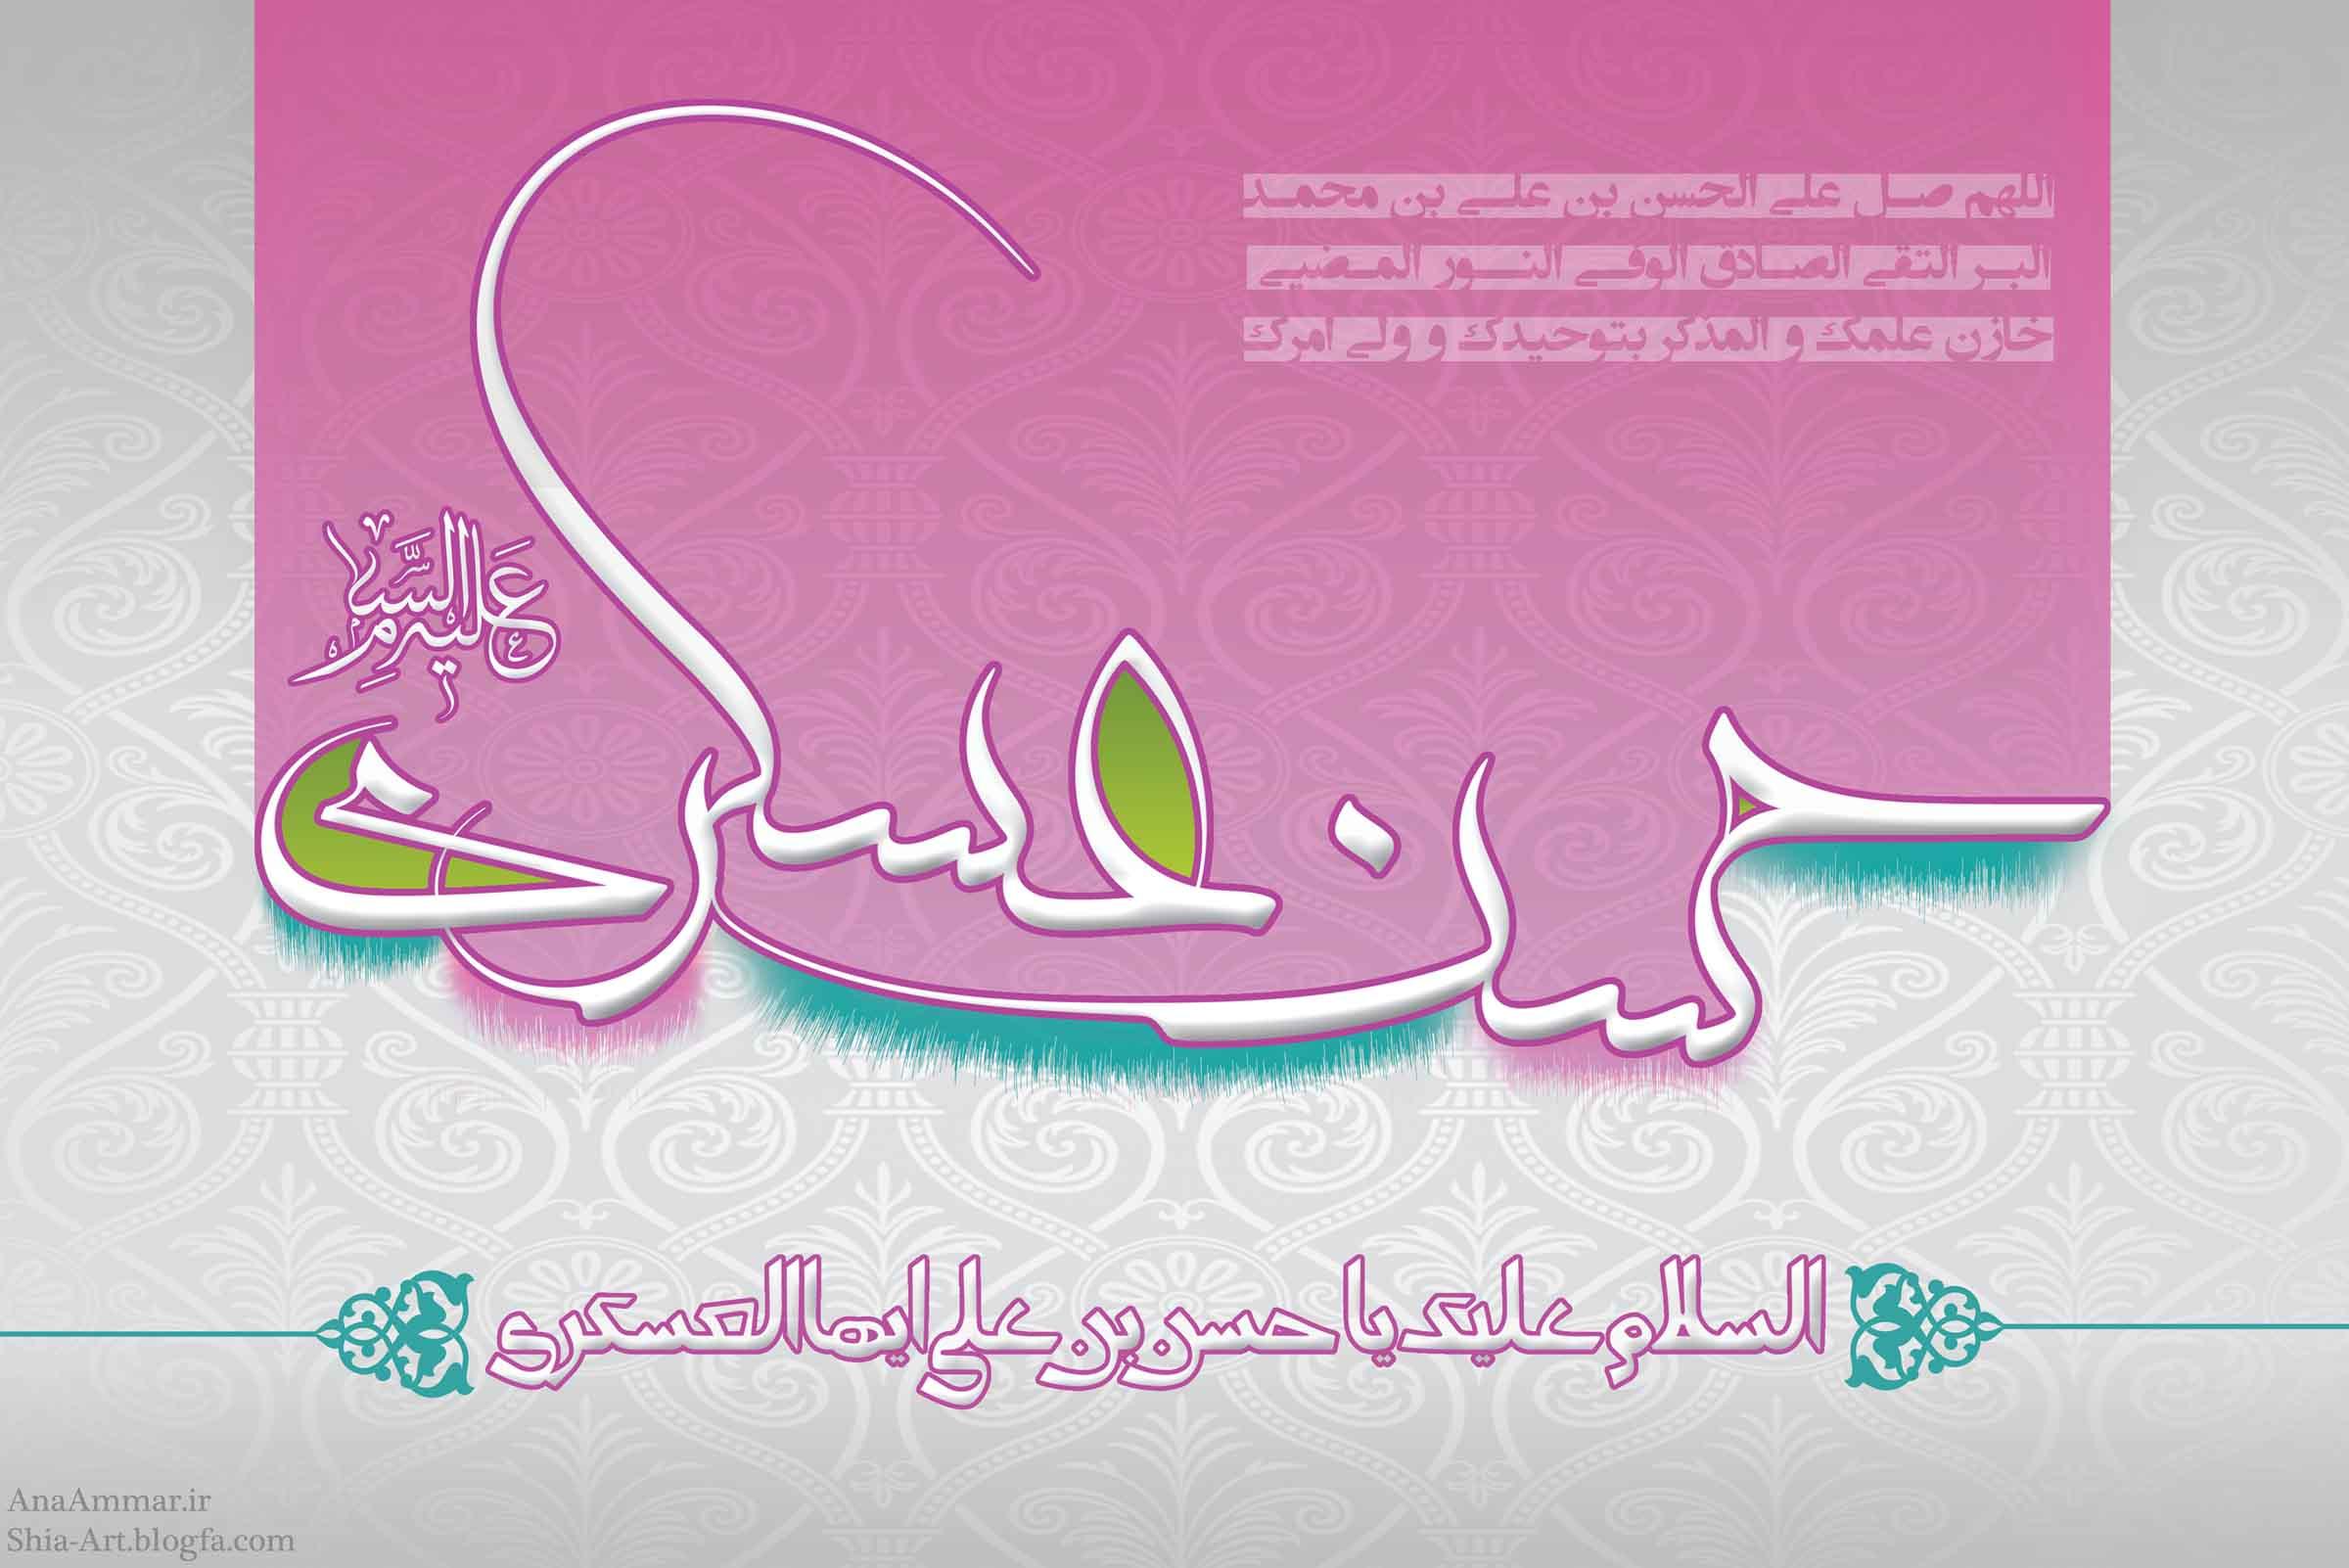 بنر و پوستر ولادت امام حسن عسکری (ع)